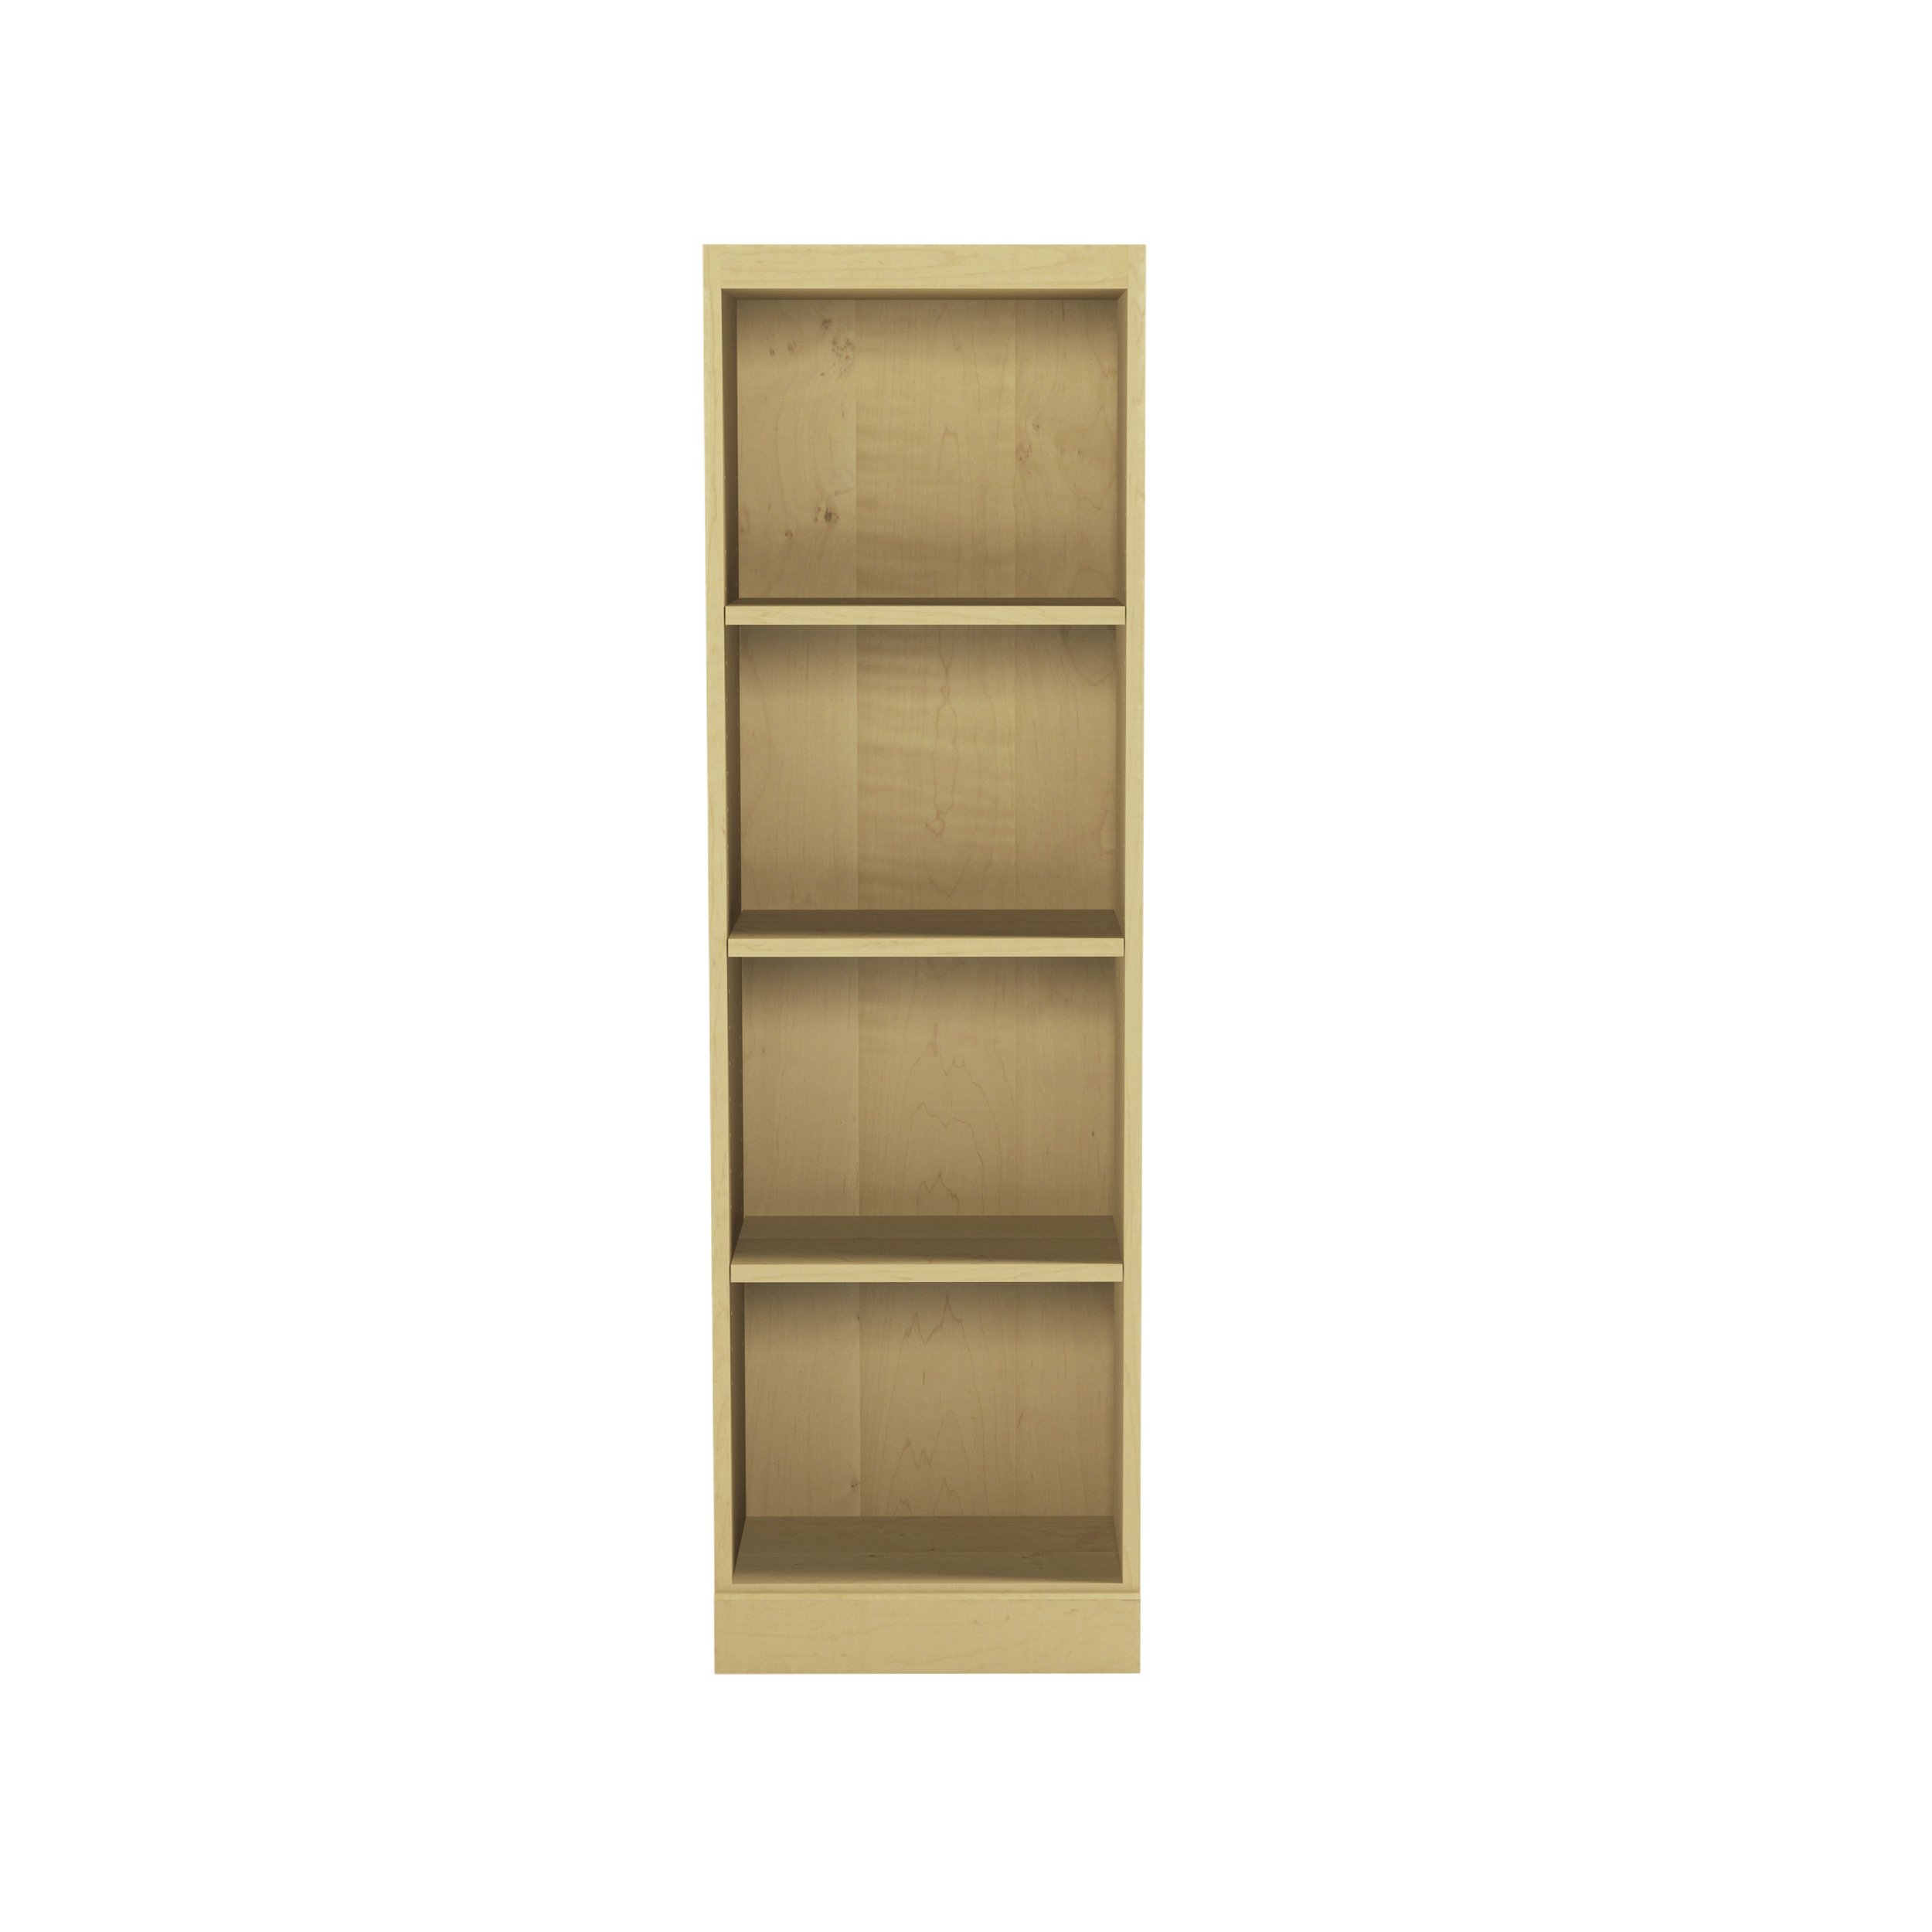 Flexmoderne 58″ In Height Bookshelf